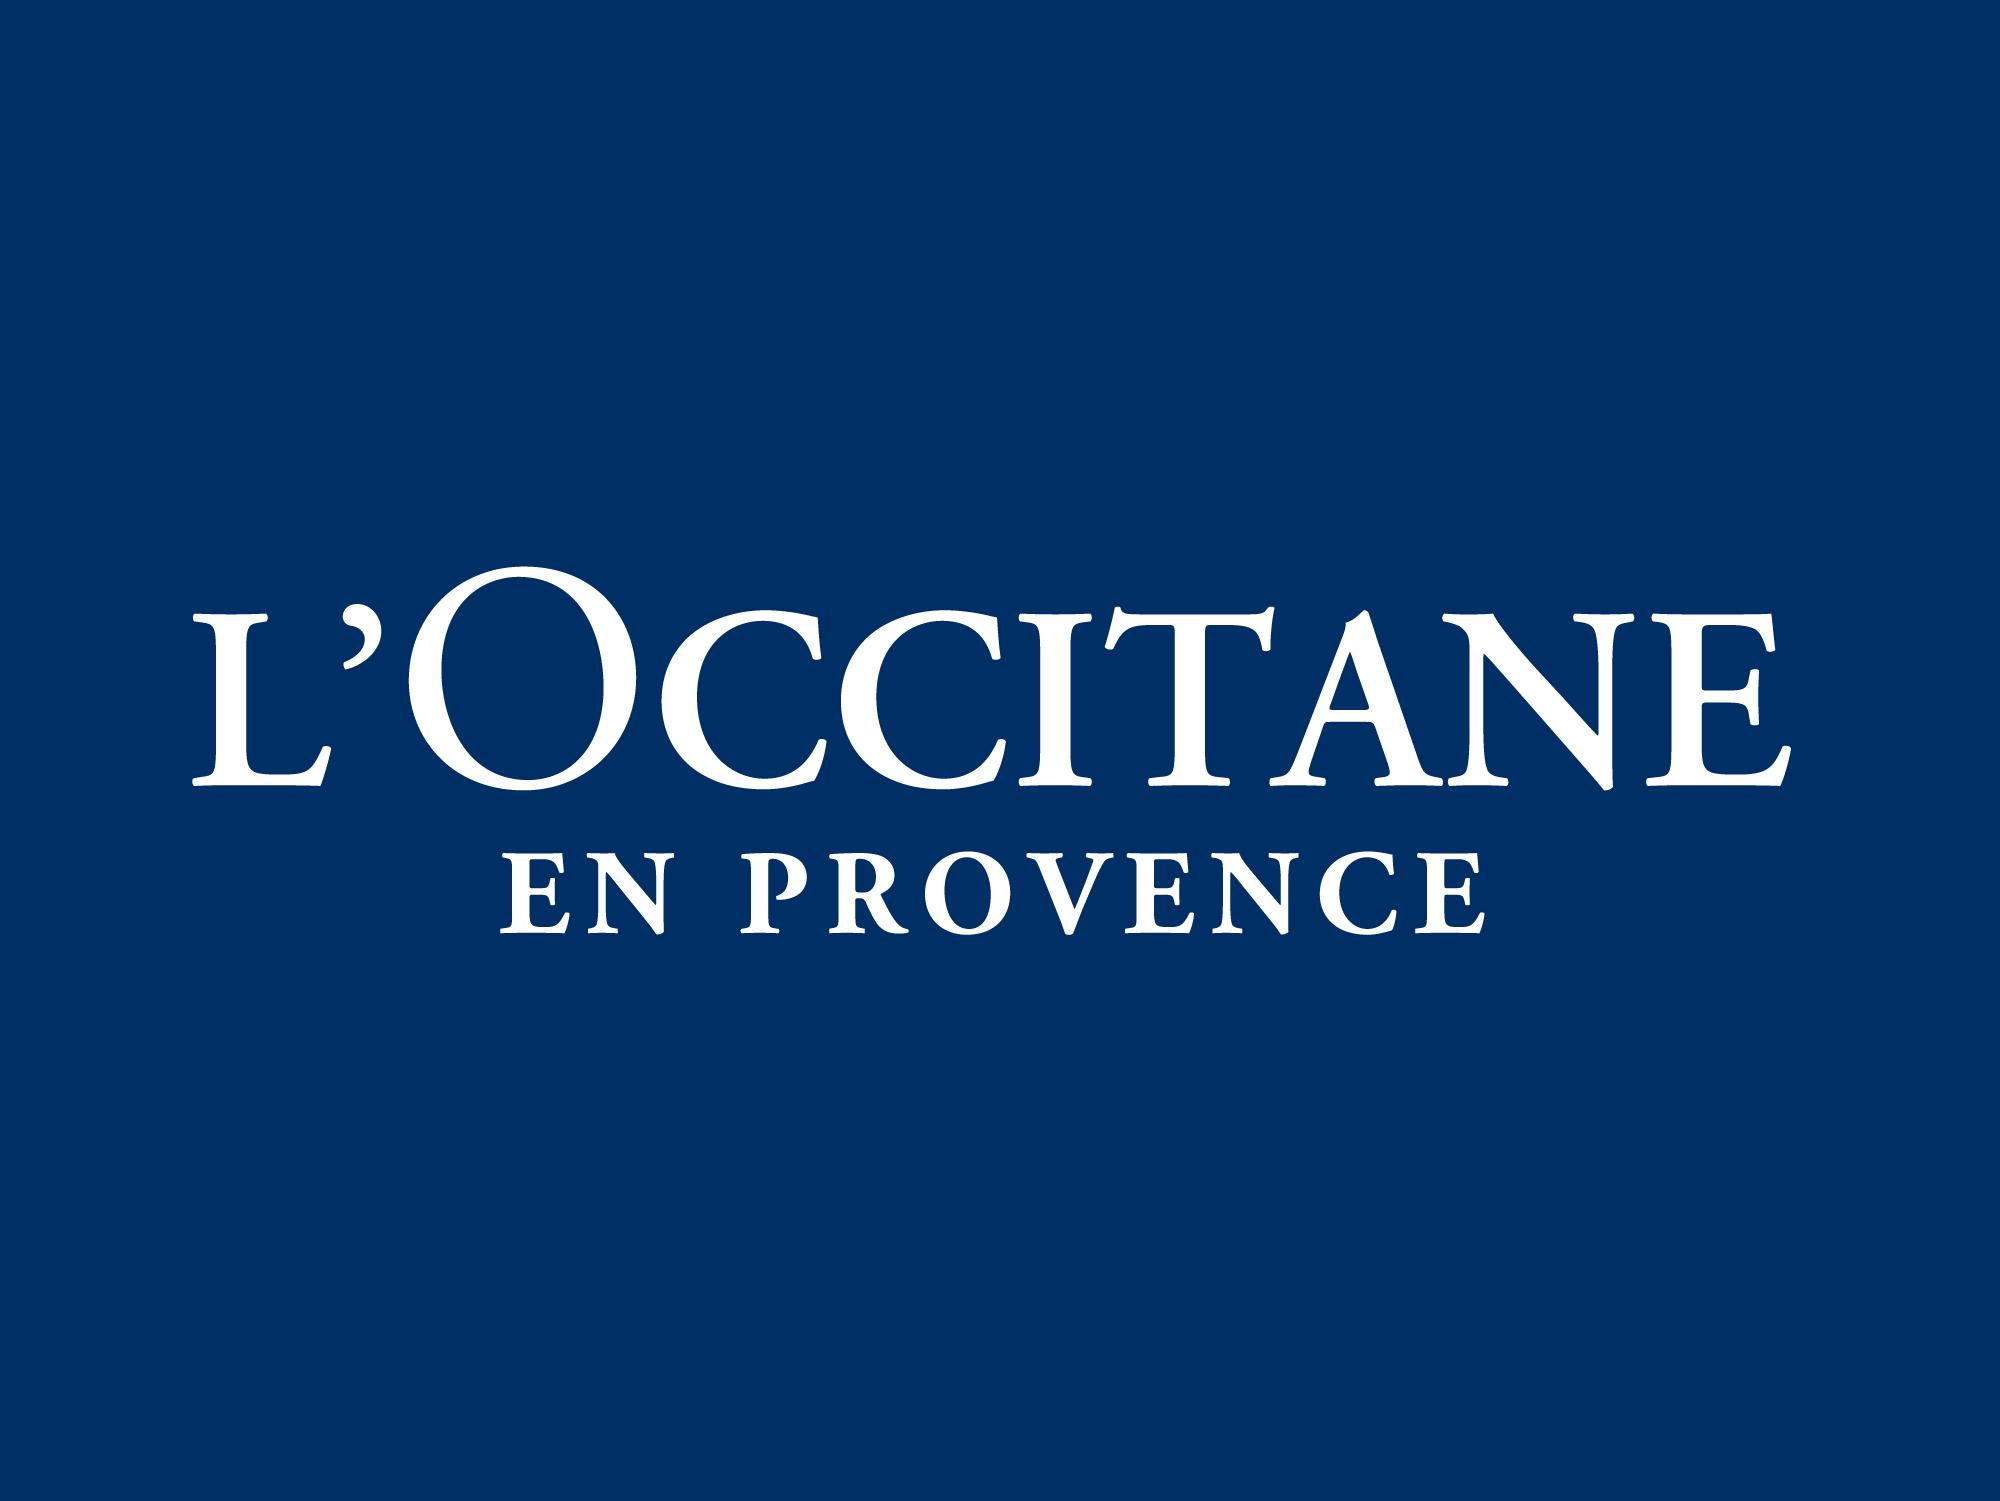 L'Occitane - Sale of L'Occitane Ireland to L'Occitane International